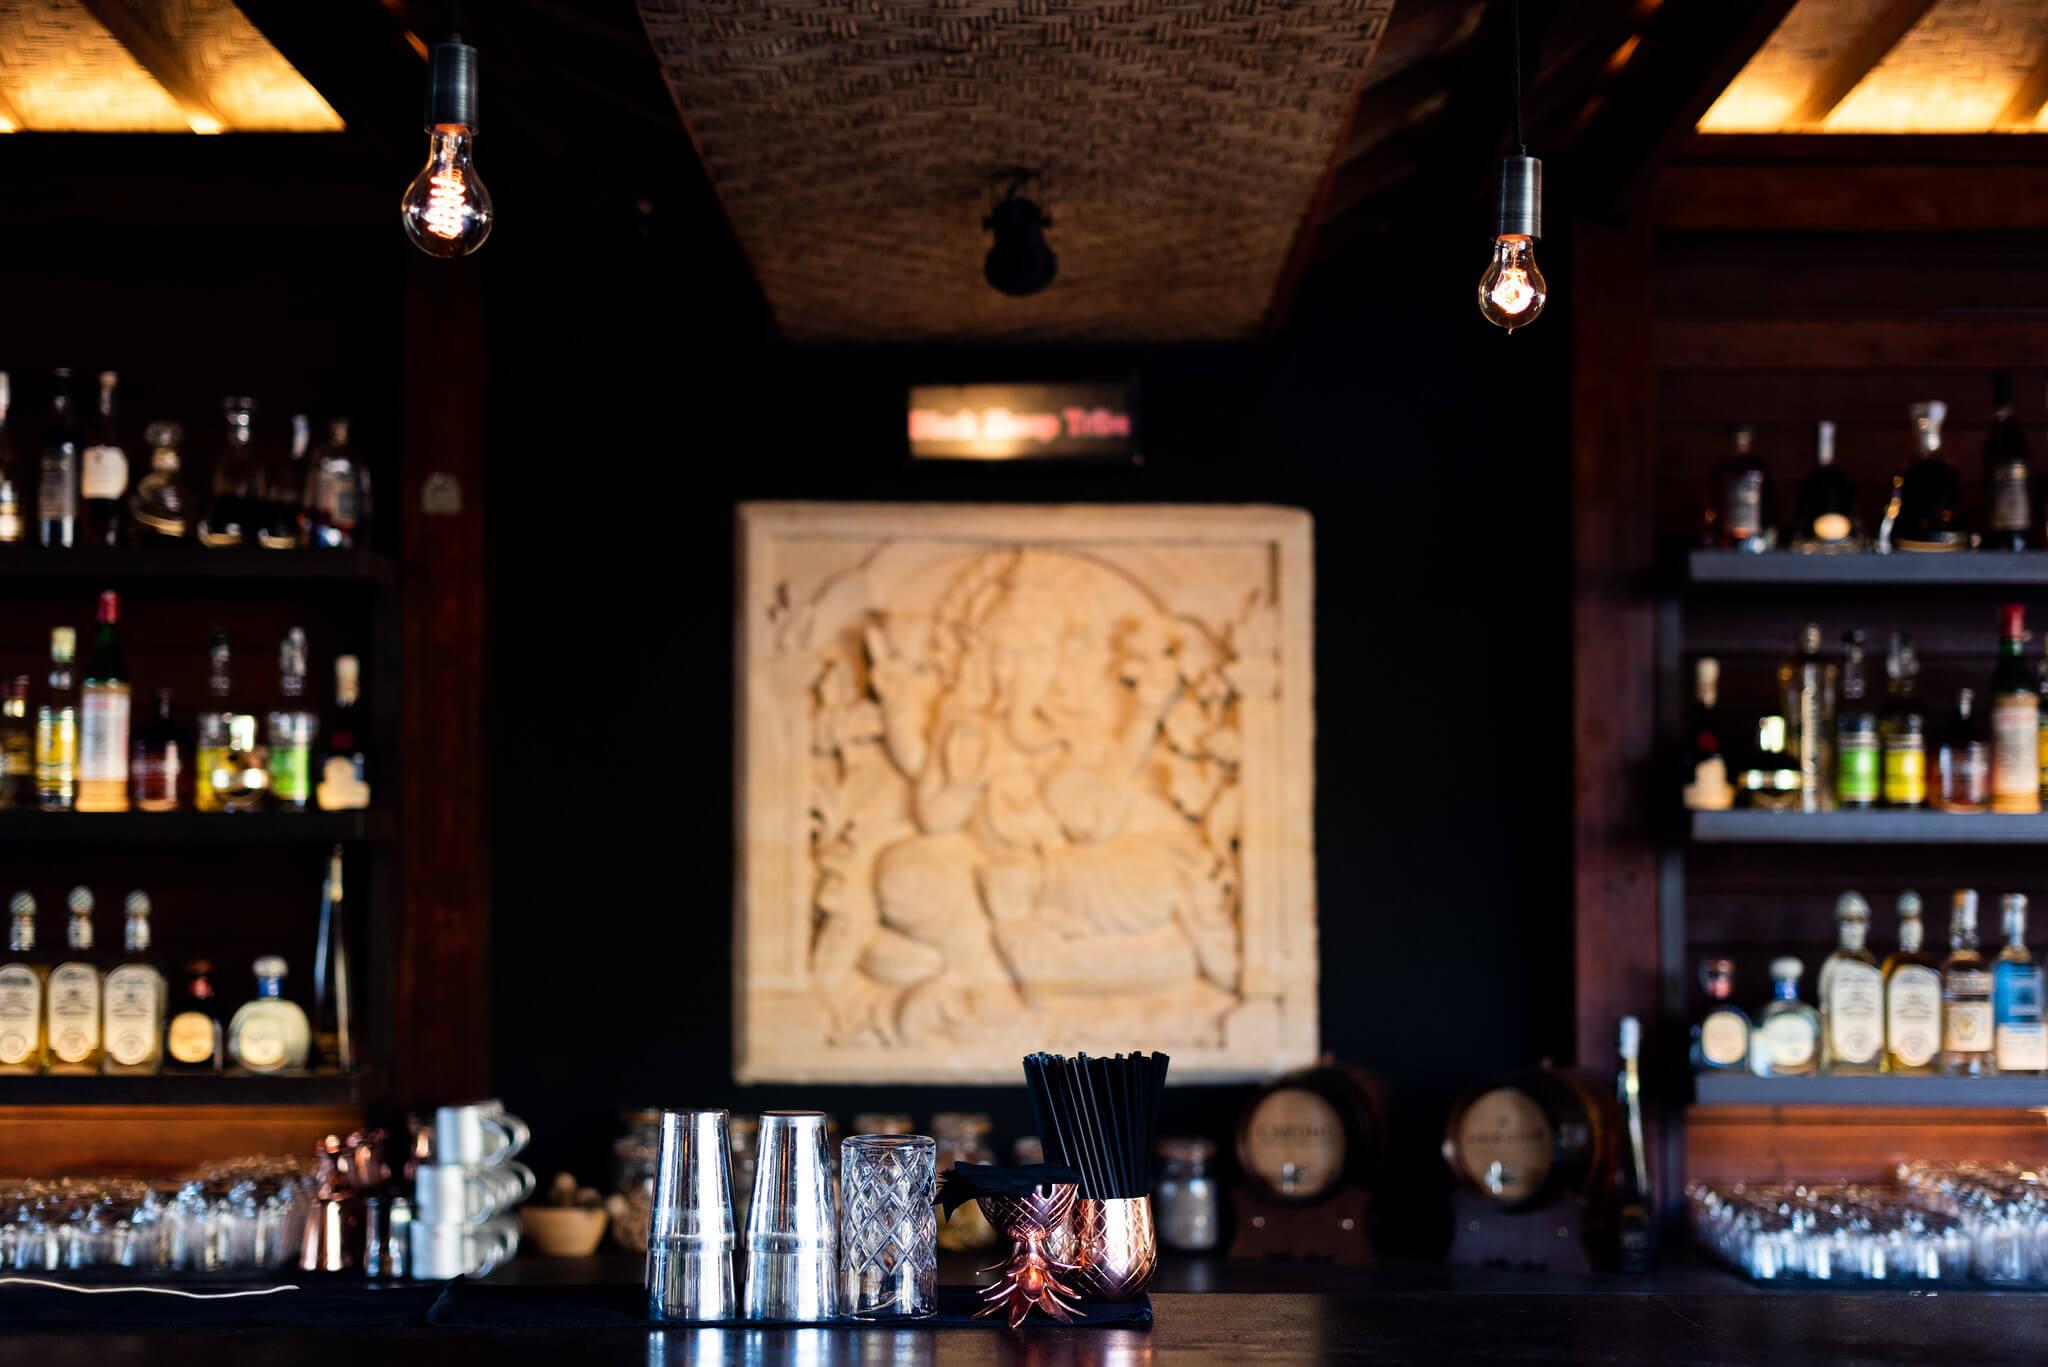 https://www.white-ibiza.com/wp-content/uploads/2020/03/bambuddha-tantra-cocktail-palace-2020-01.jpg